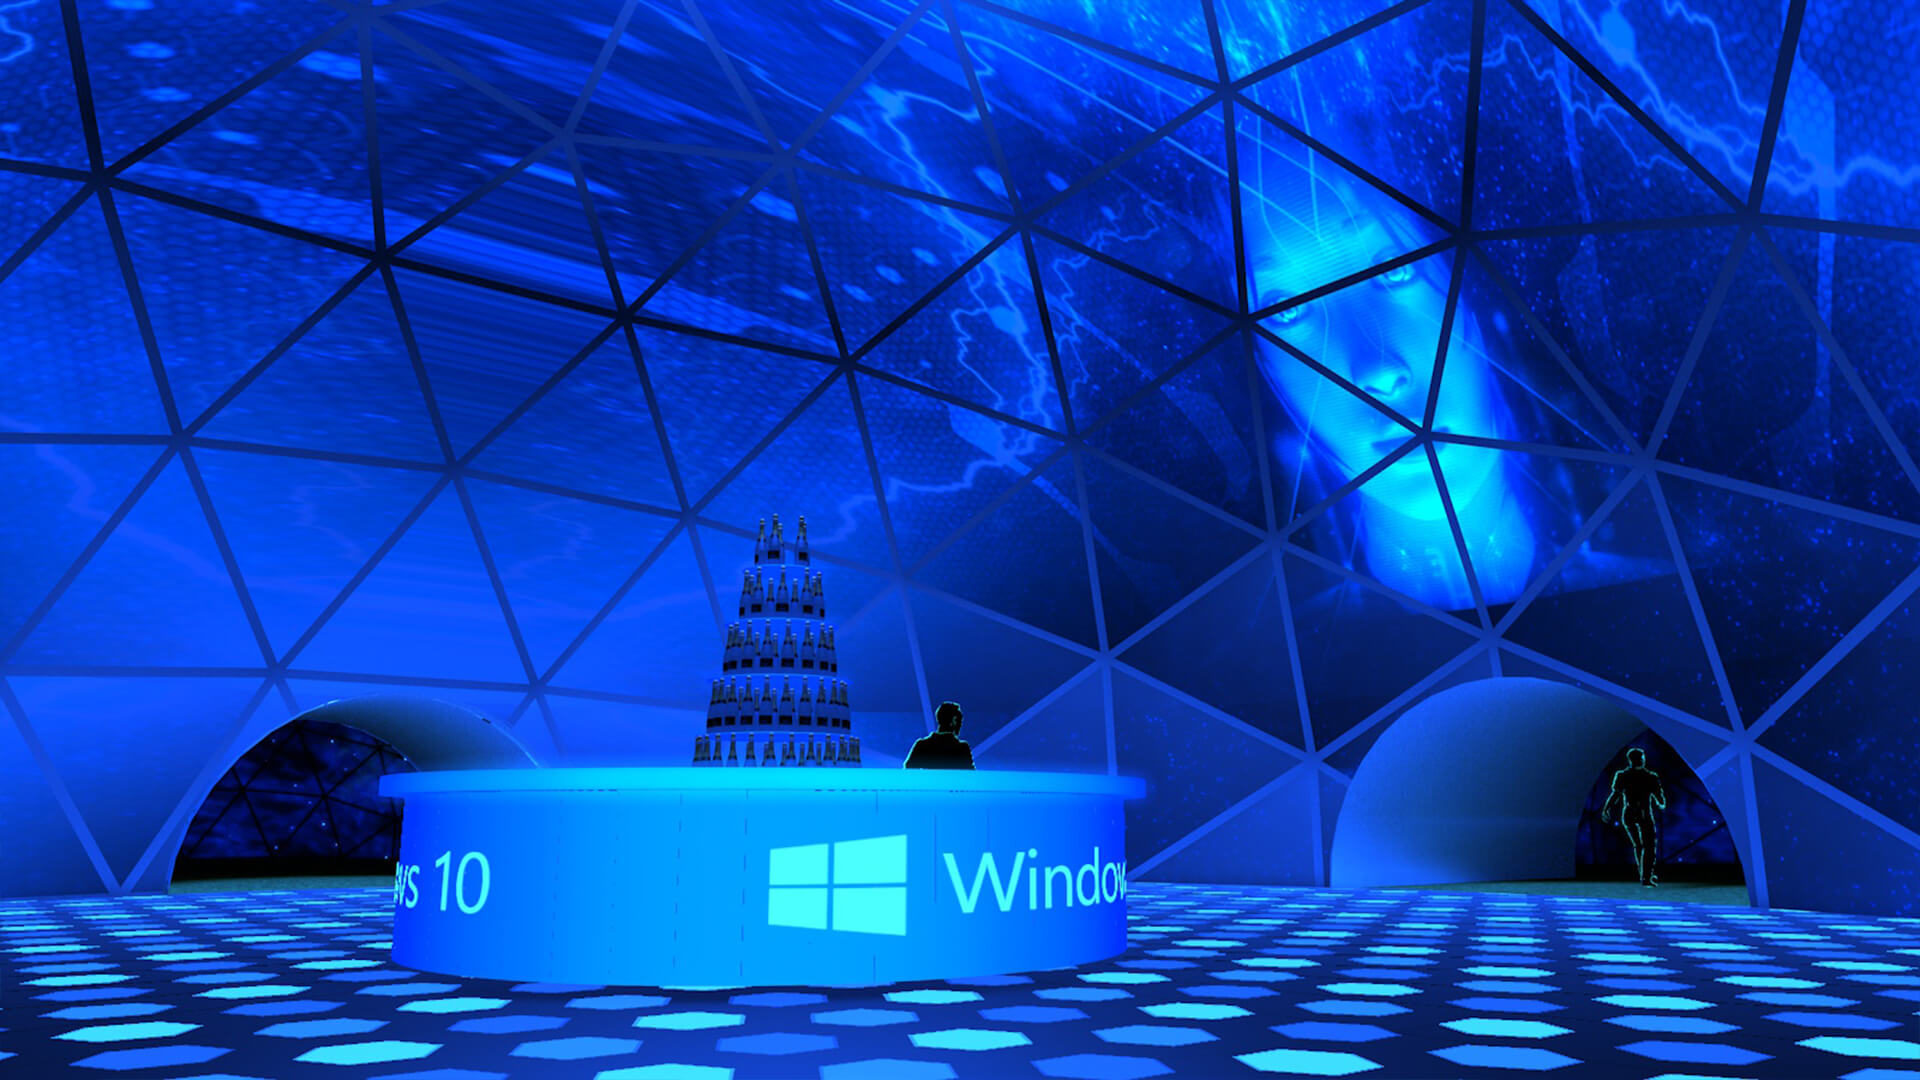 Windows Motion Graphics Projection